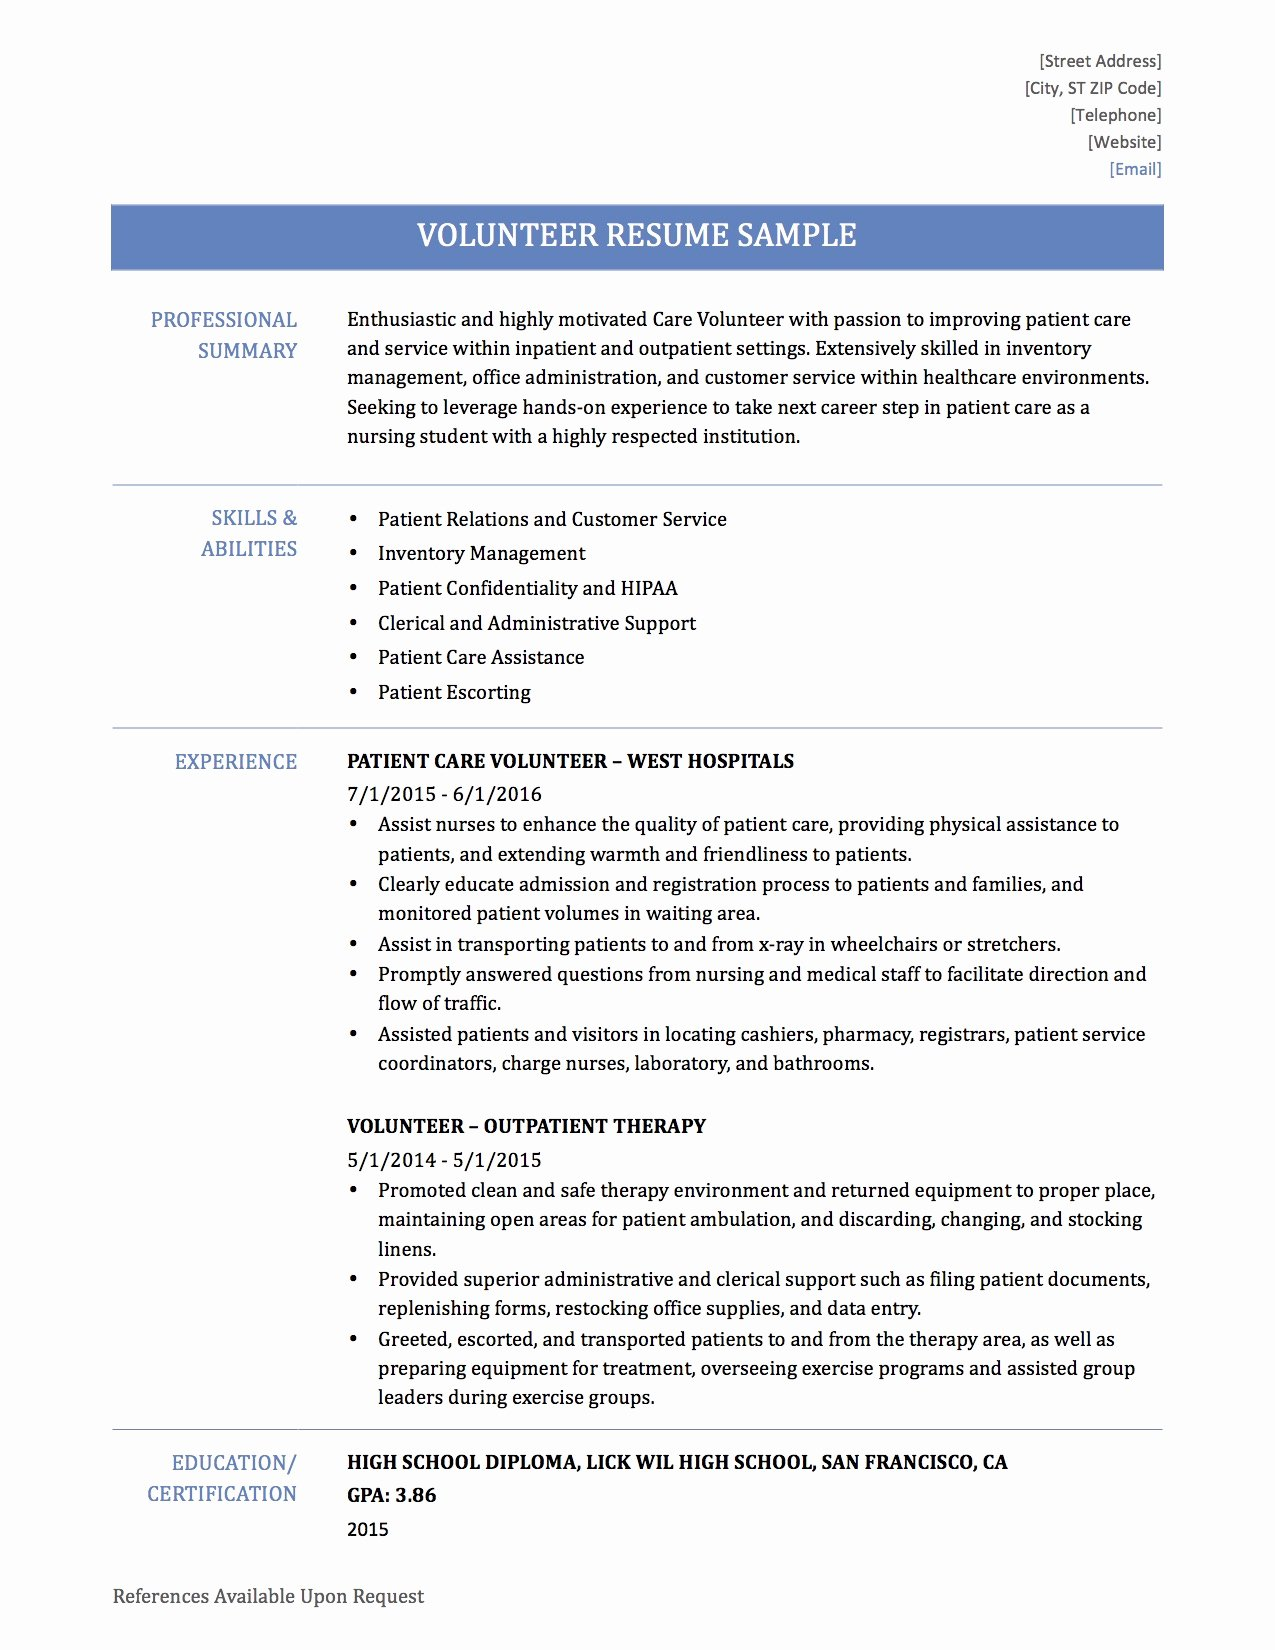 Volunteering Resume Resume Ideas